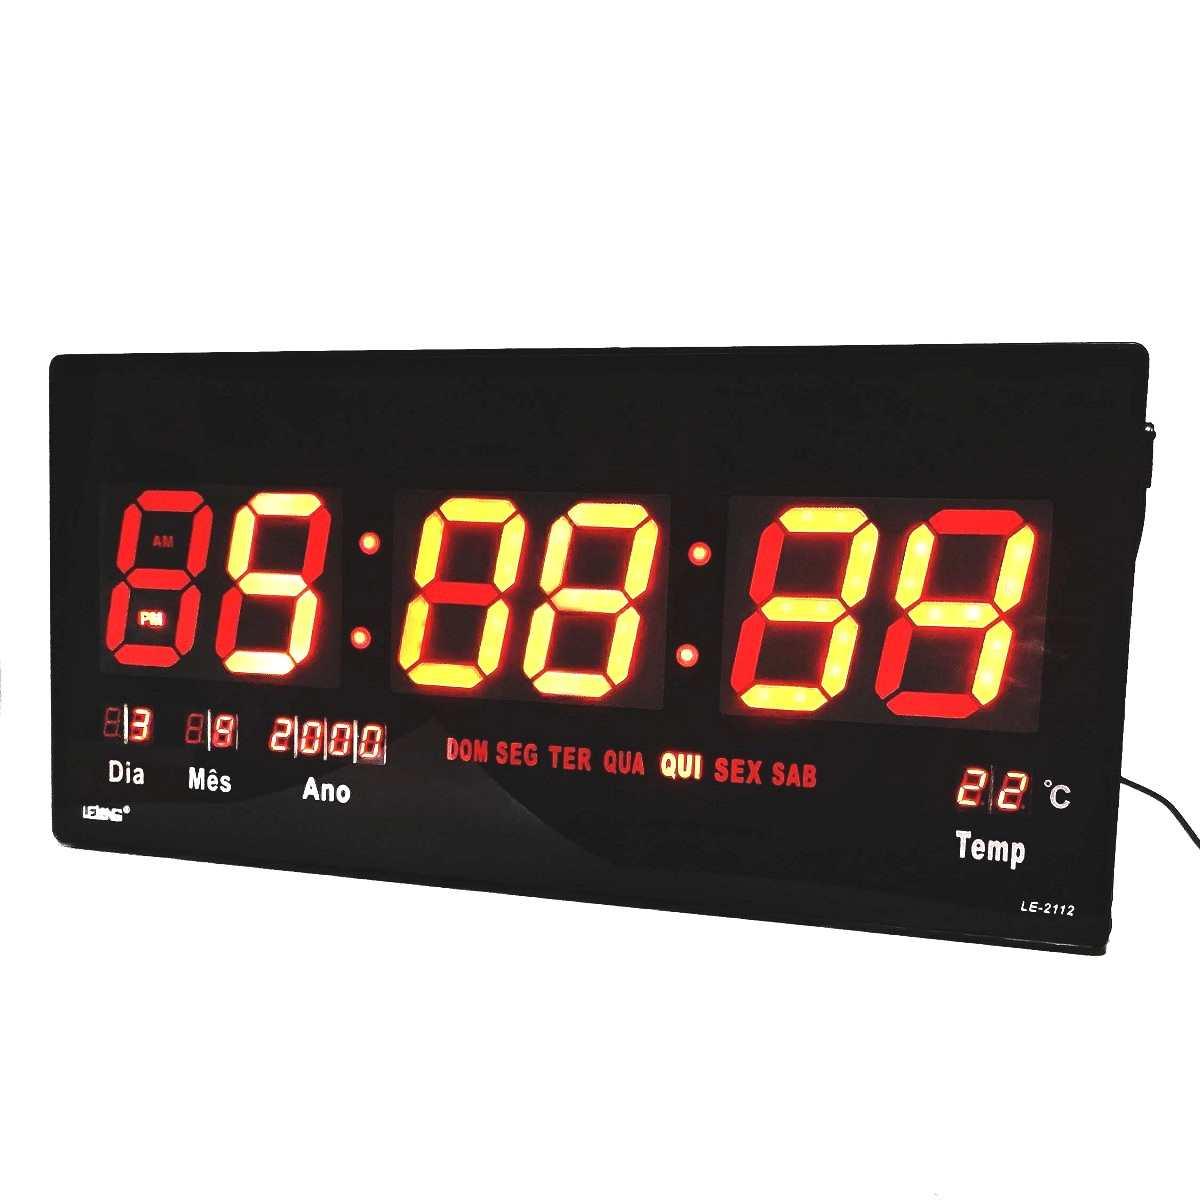 Relógio De Parede Digital Led Grande Data Temperatura Despertador Lelong-Le-2112